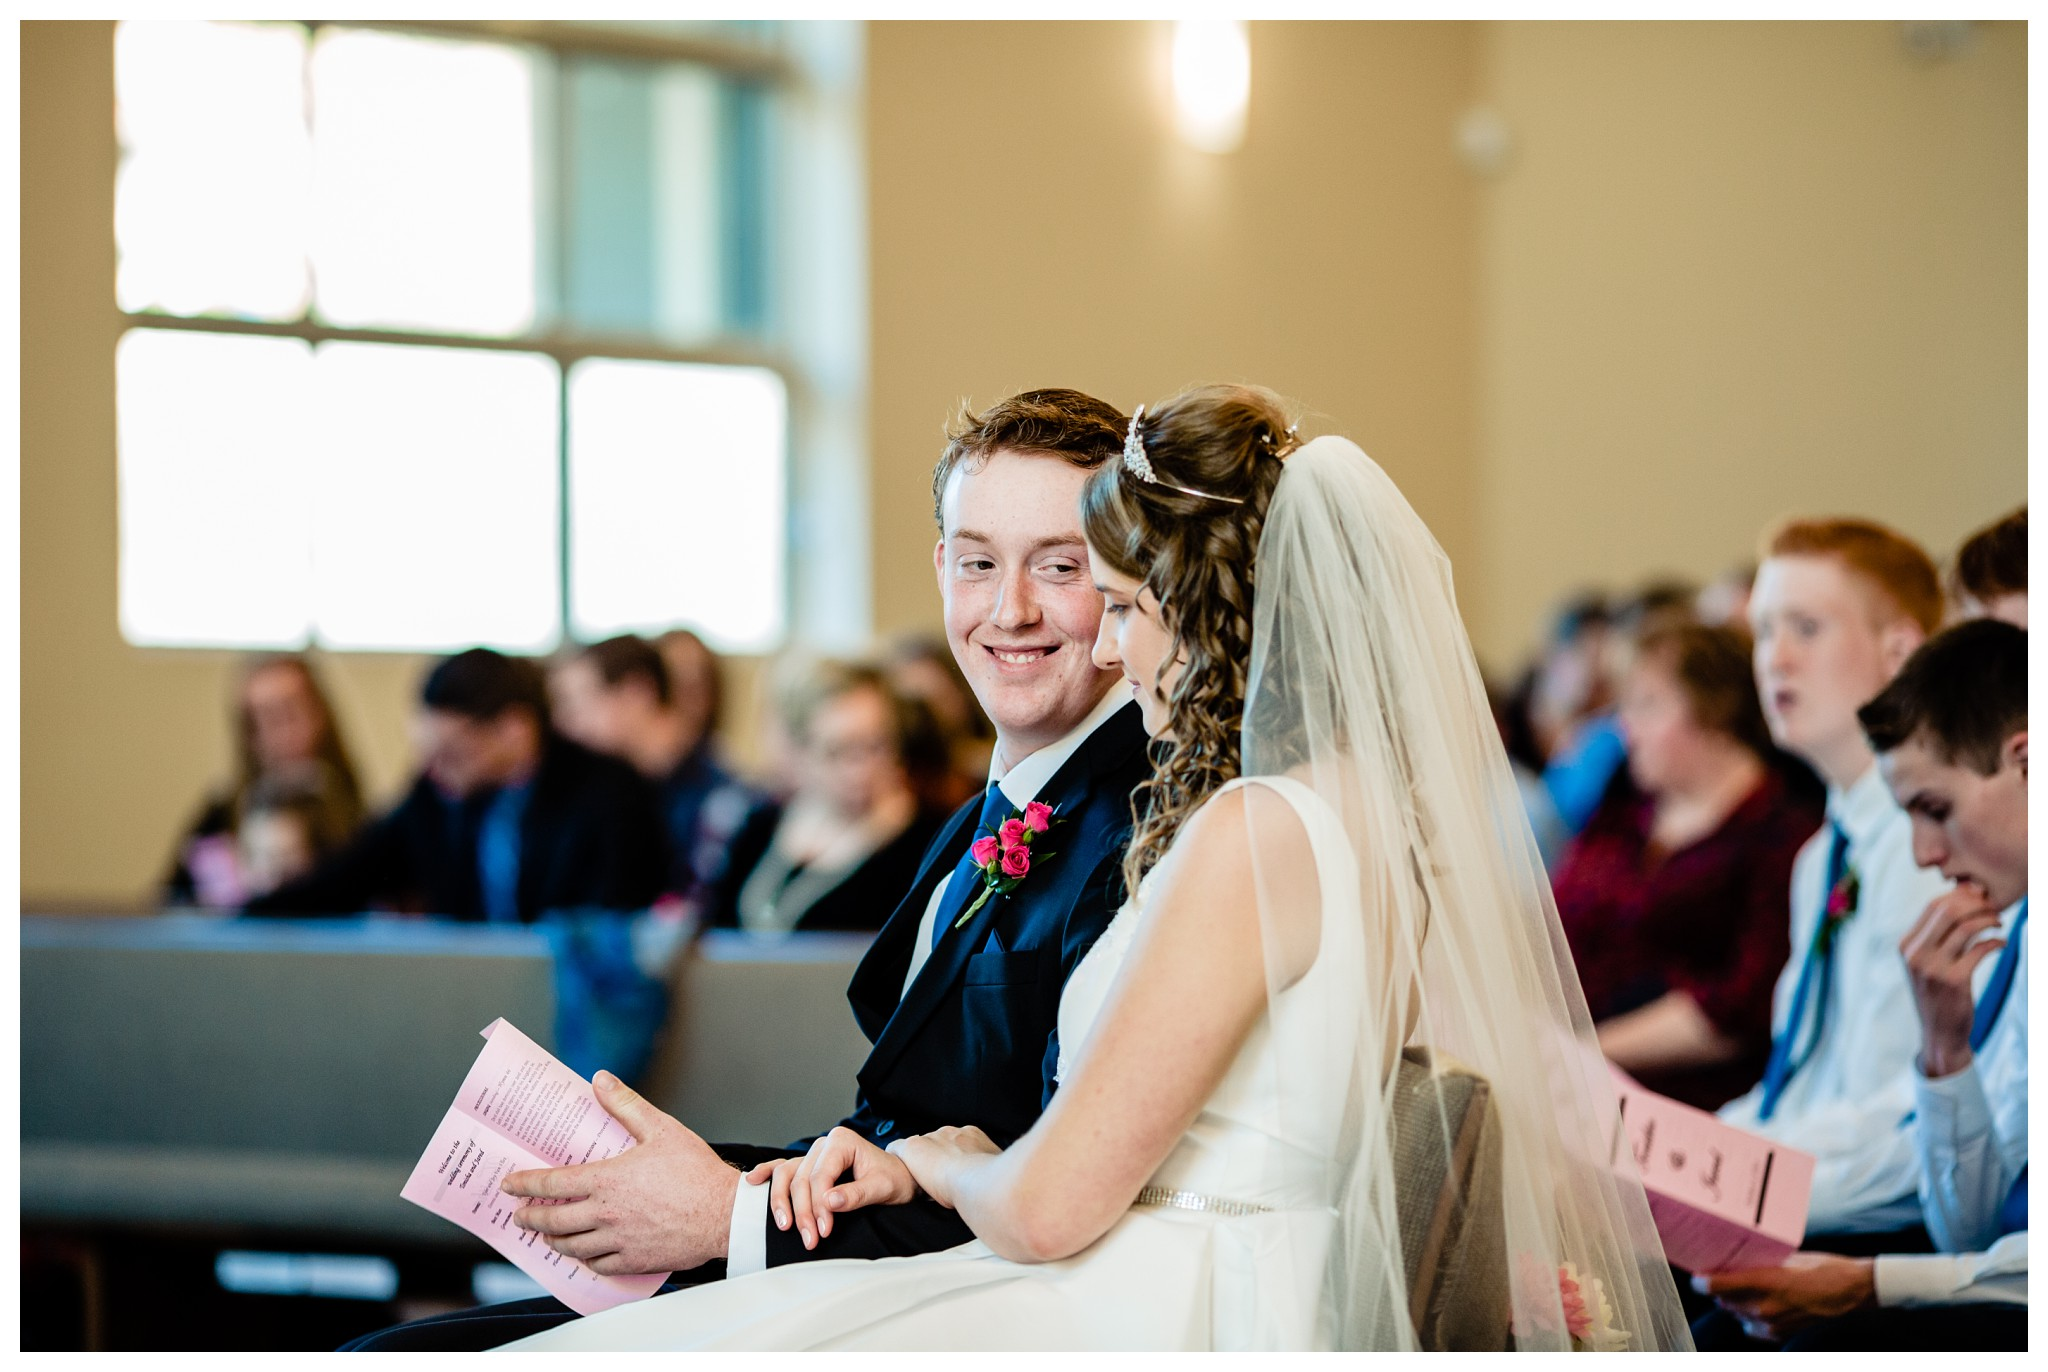 Aldergrove Park Christian Church Wedding Photography Pink Flowers Blue Bridesmaid Dress Fall_0062.jpg